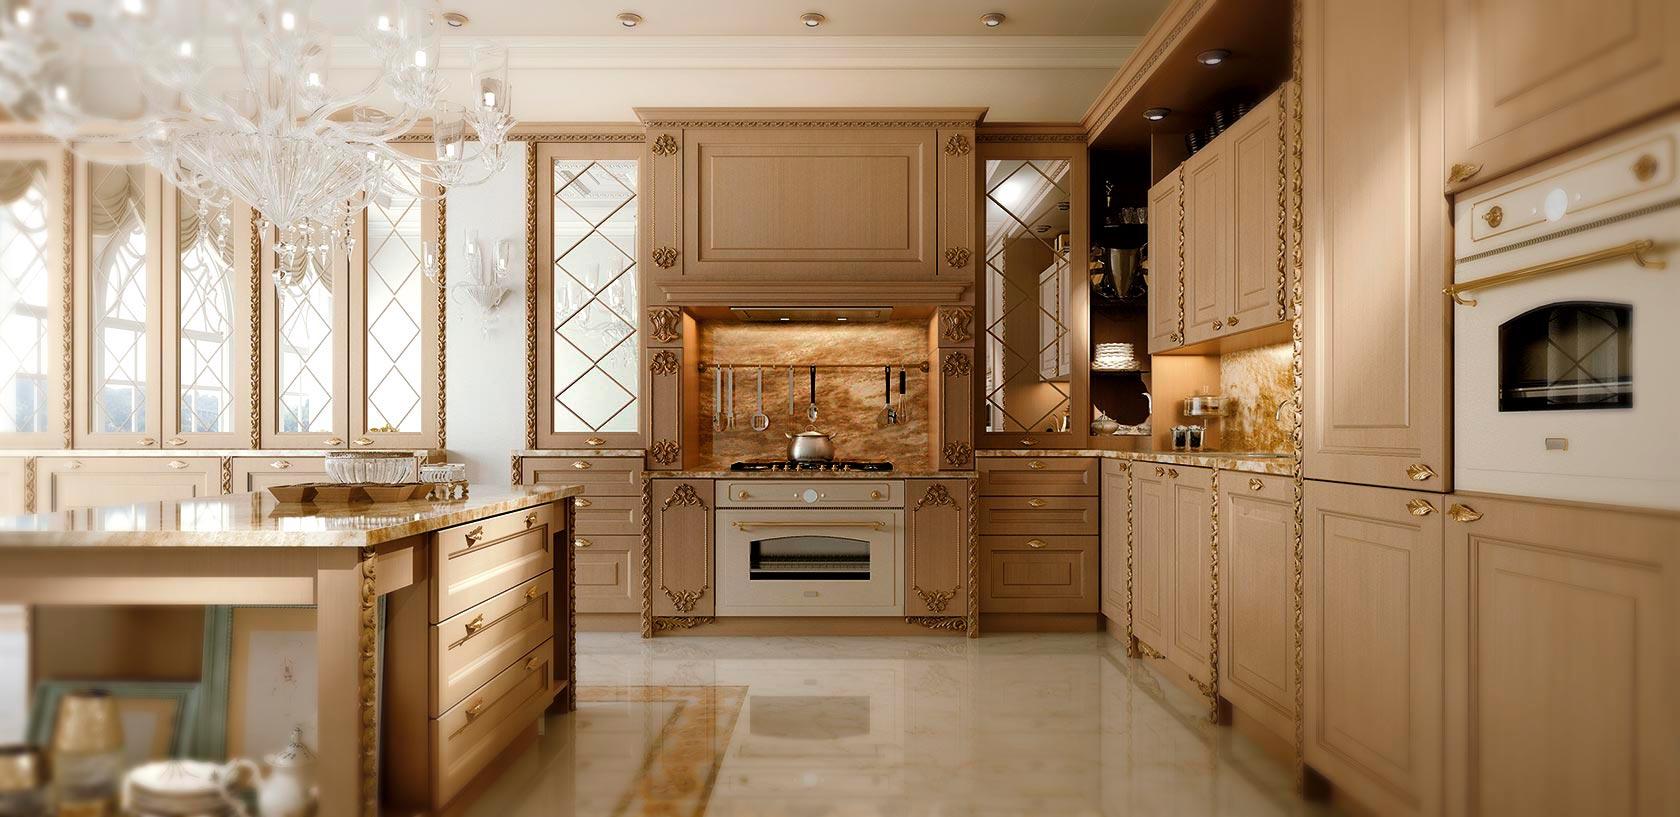 Borgo antico cucine - Cucine finta muratura lube ...